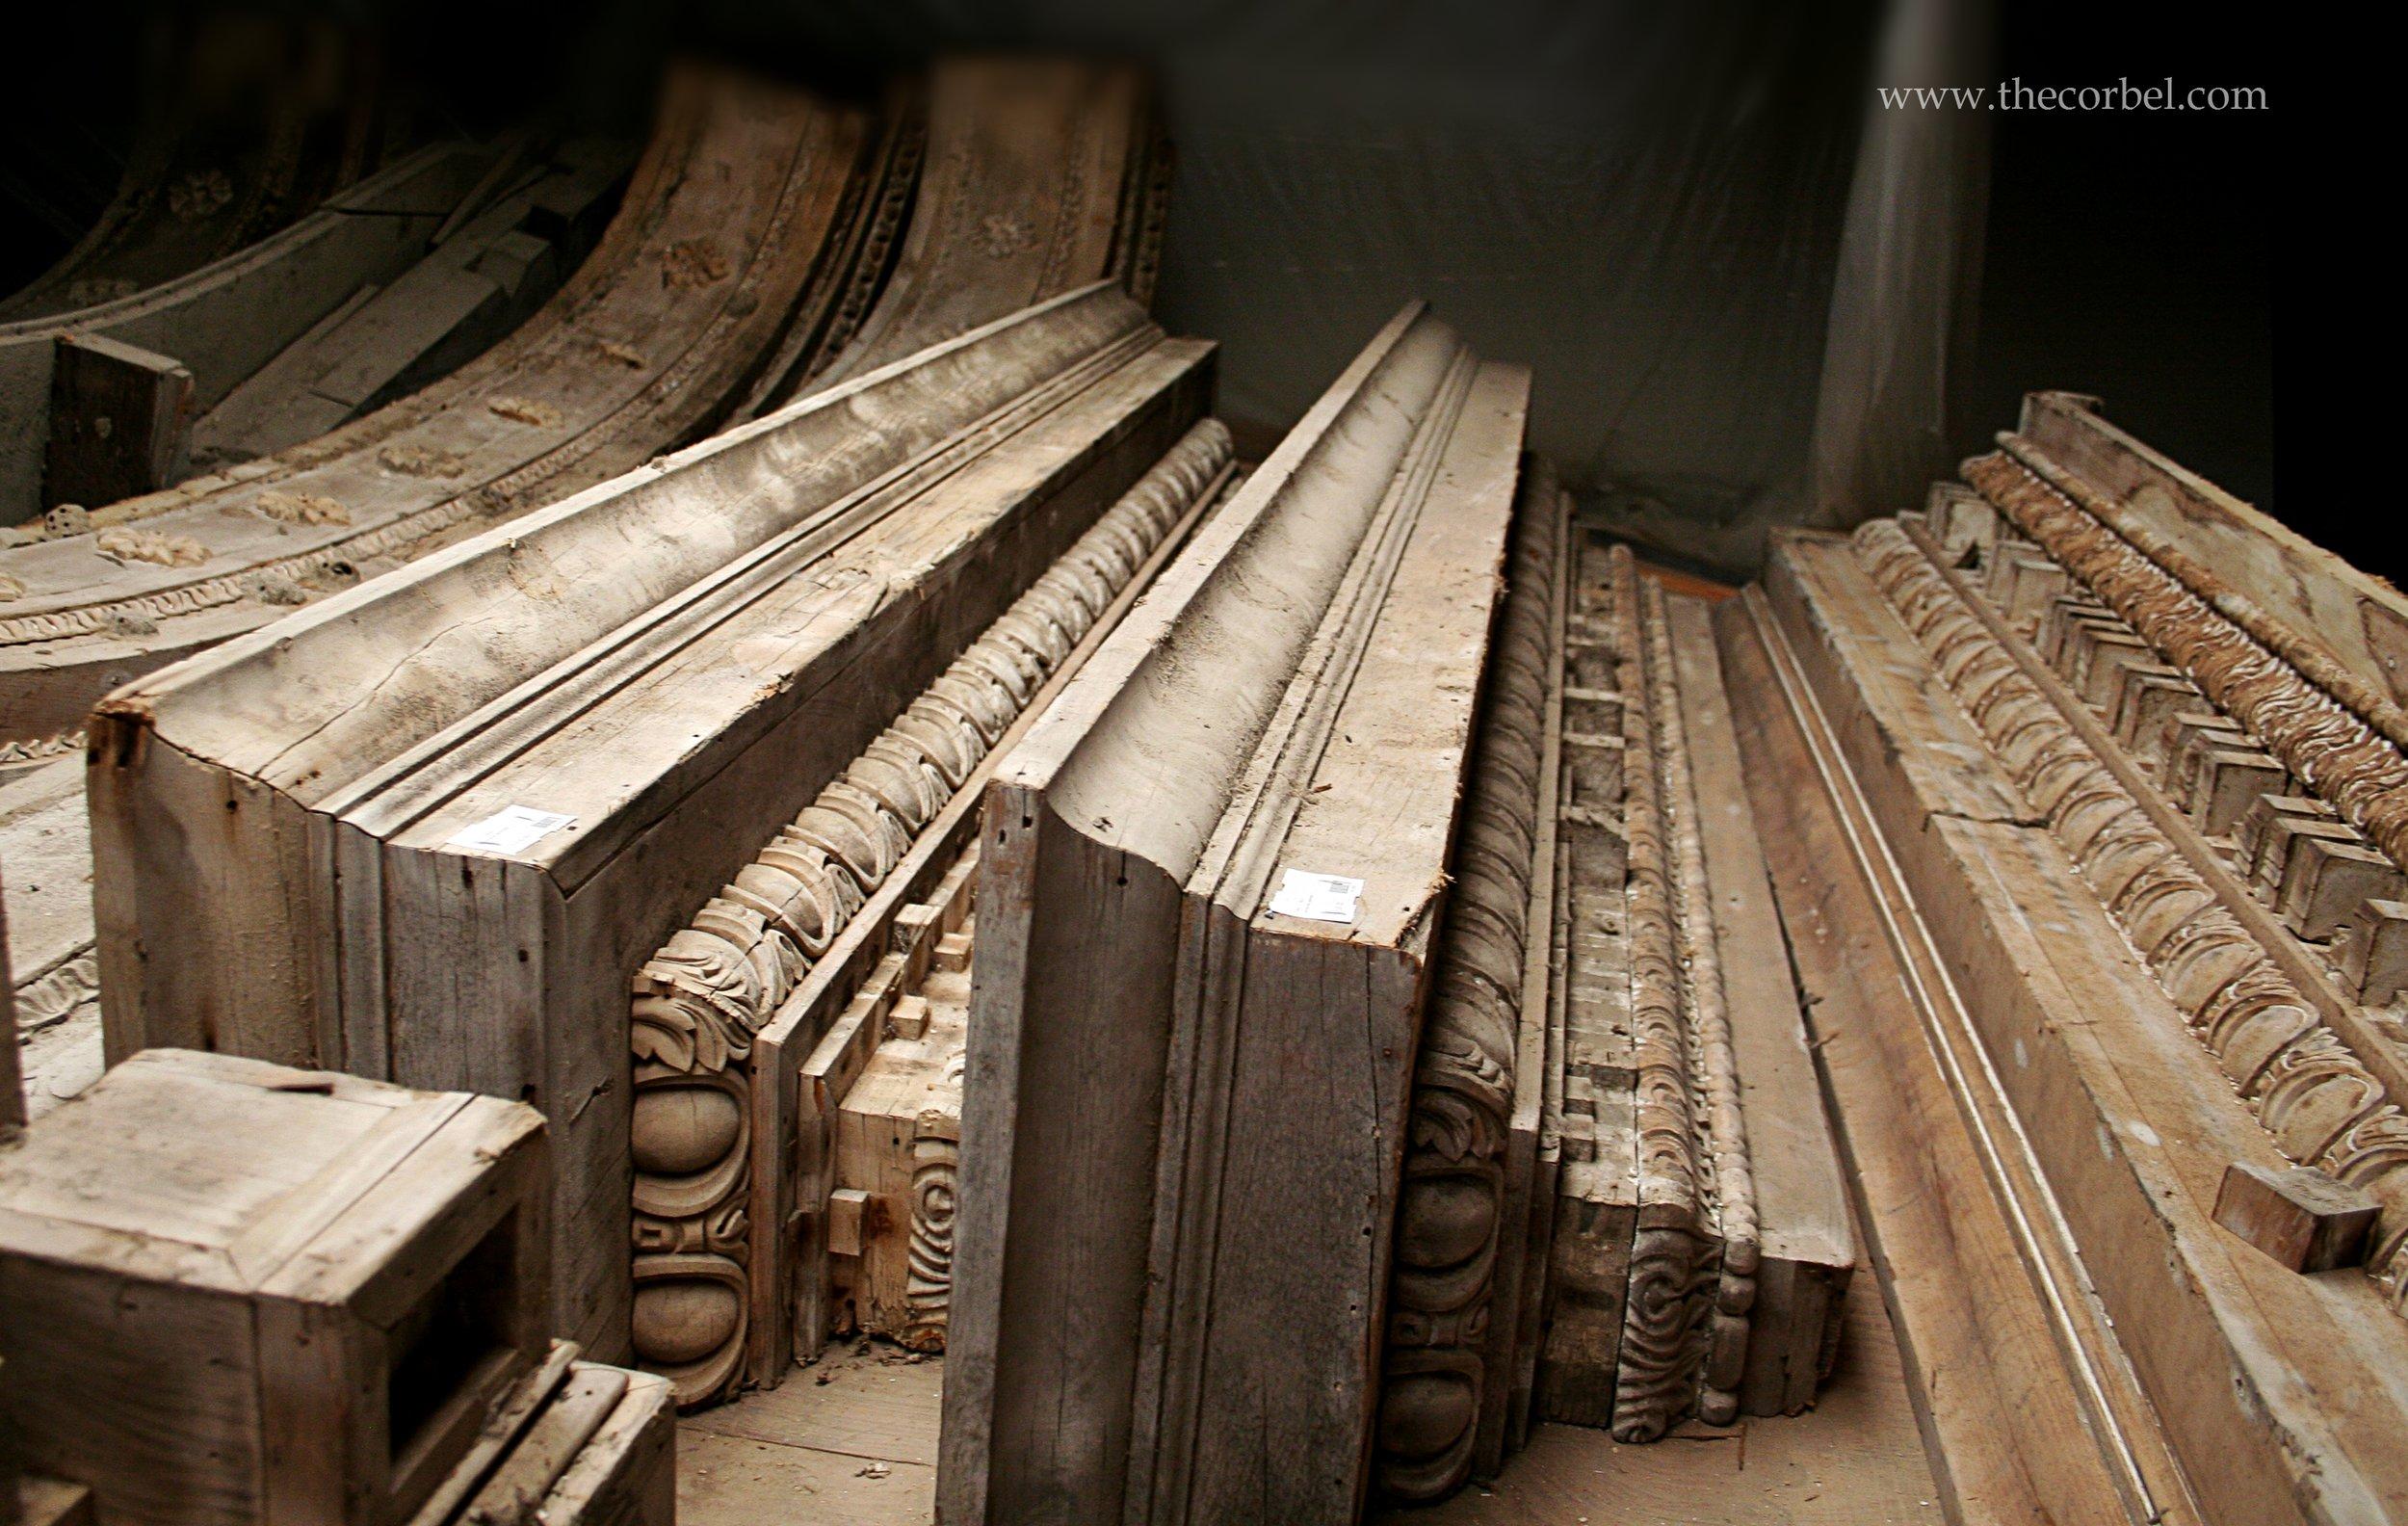 st charles pediment mantle.jpg